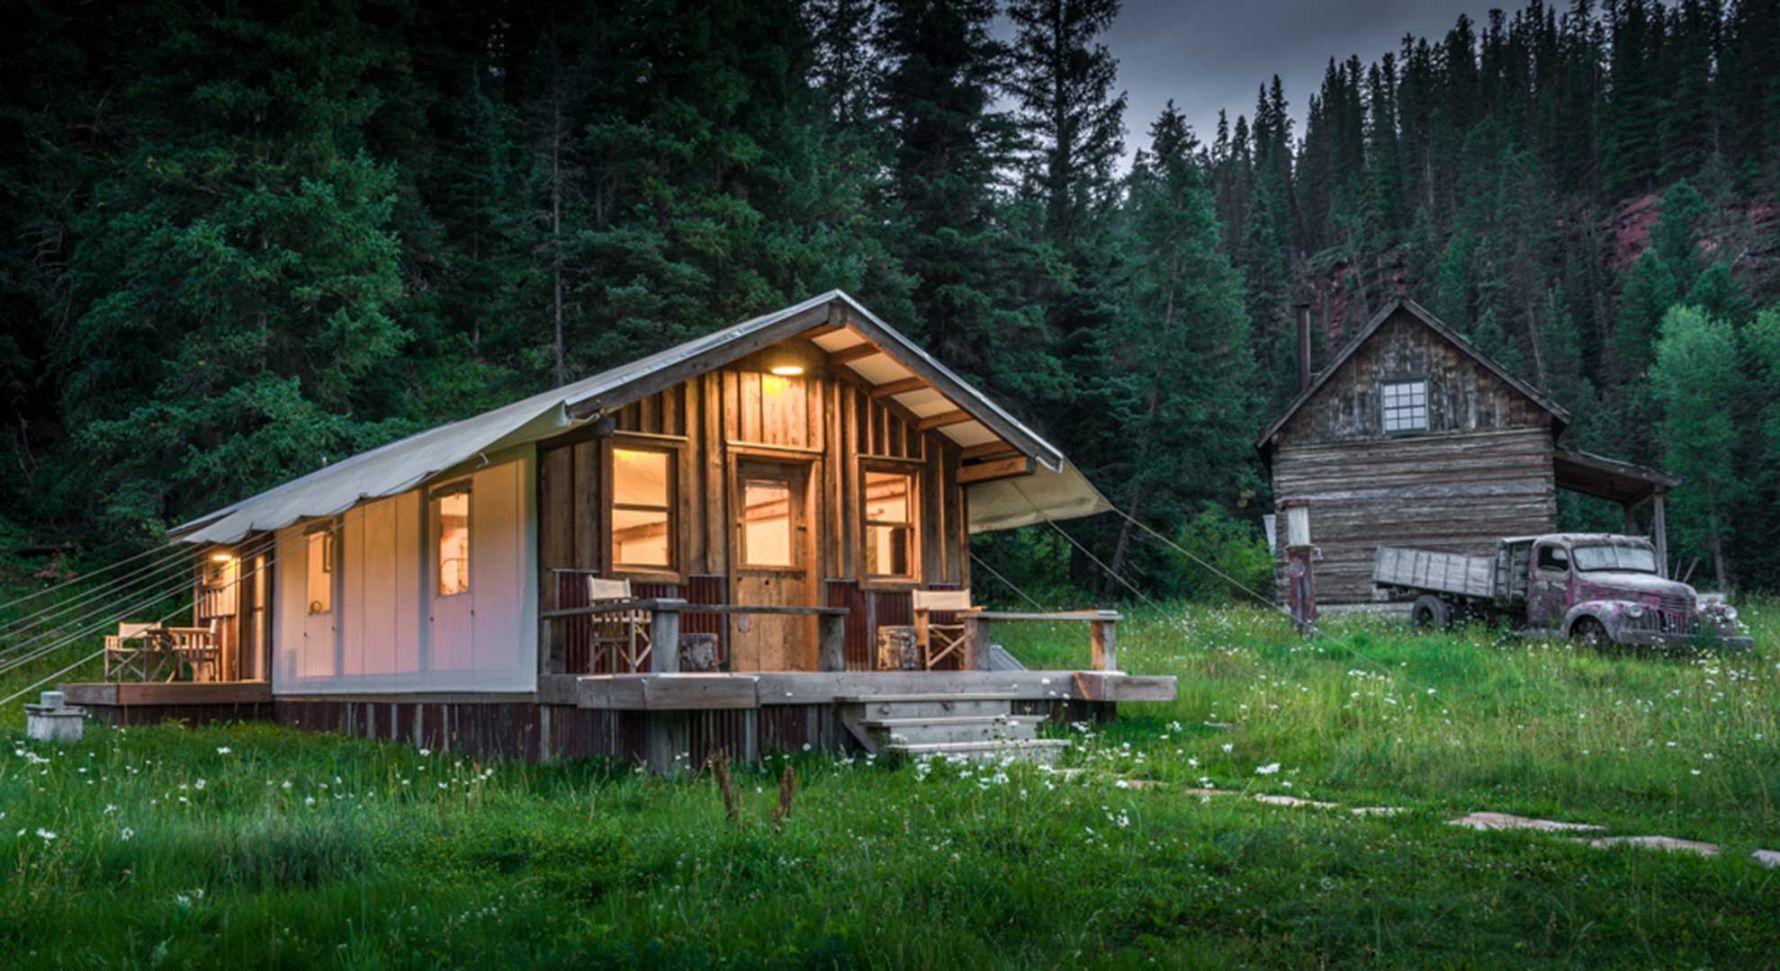 Canvas Tents in Luxury Colorado Rockies resort | sophisticated